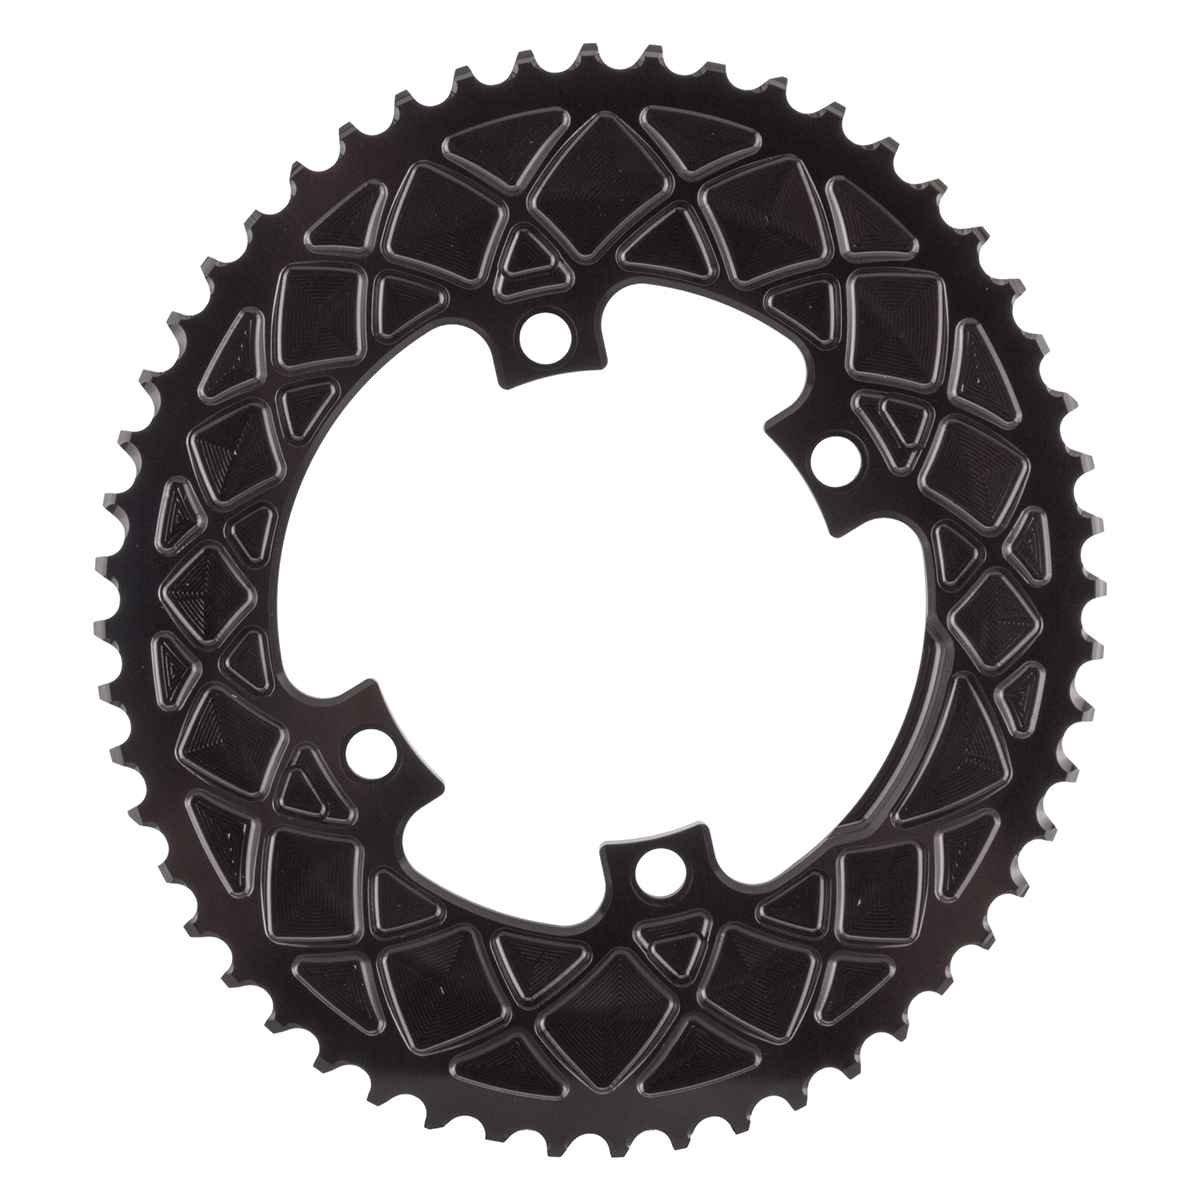 Absolute Black(アブソリュートブラック)ROV52/4BK Ovalチェーンリング ROAD 52T 110PCD 4アーム用 ブラック B01HLYOWV0